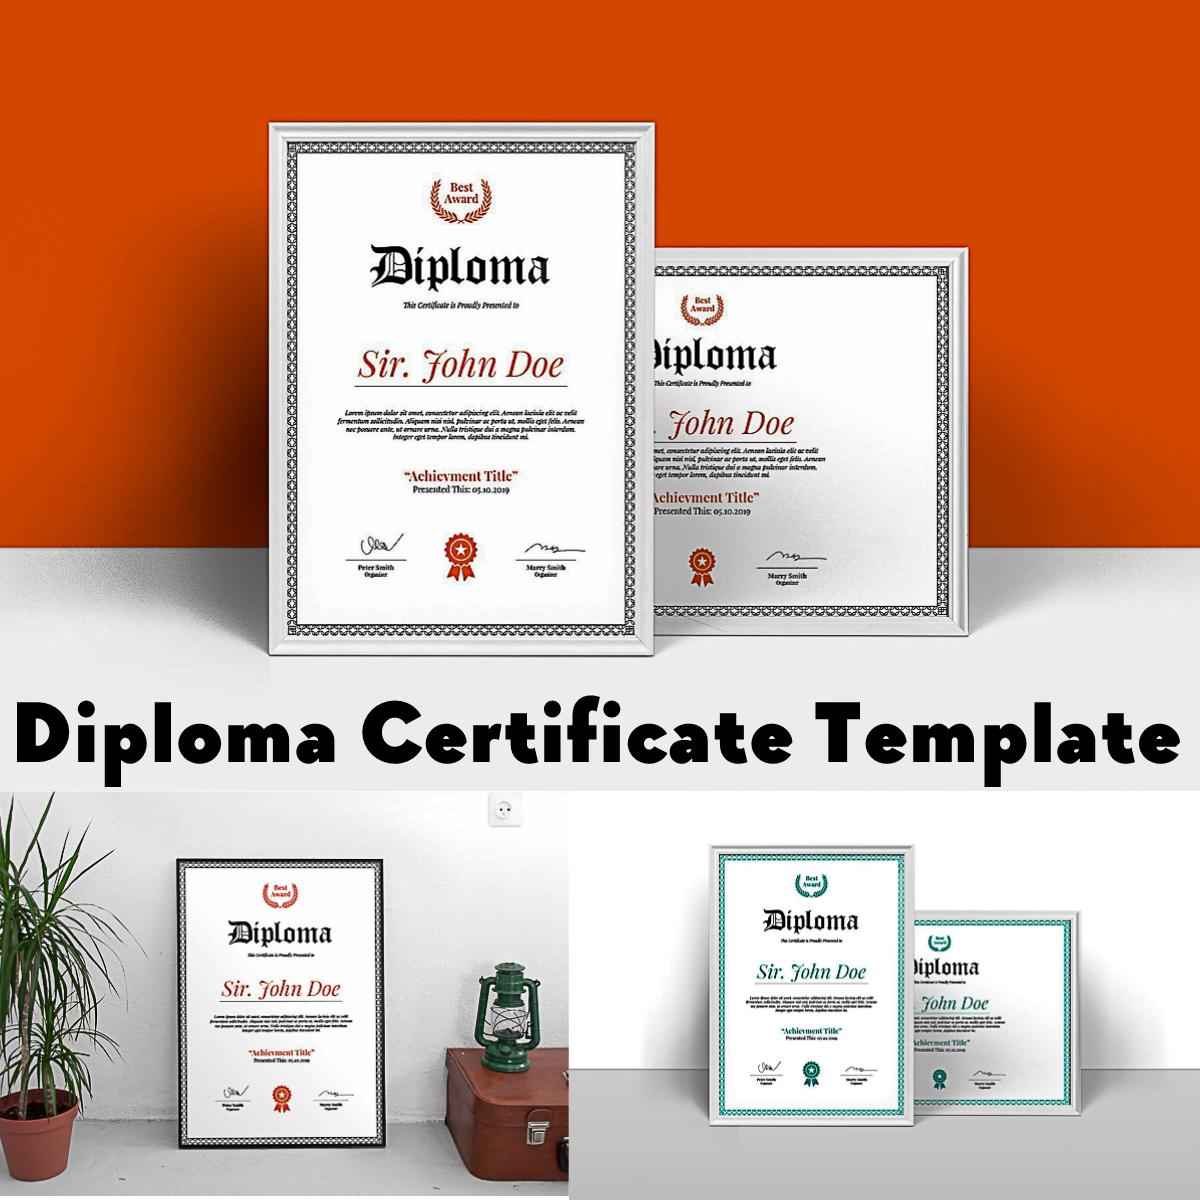 Diploma Certificate Template Free Download